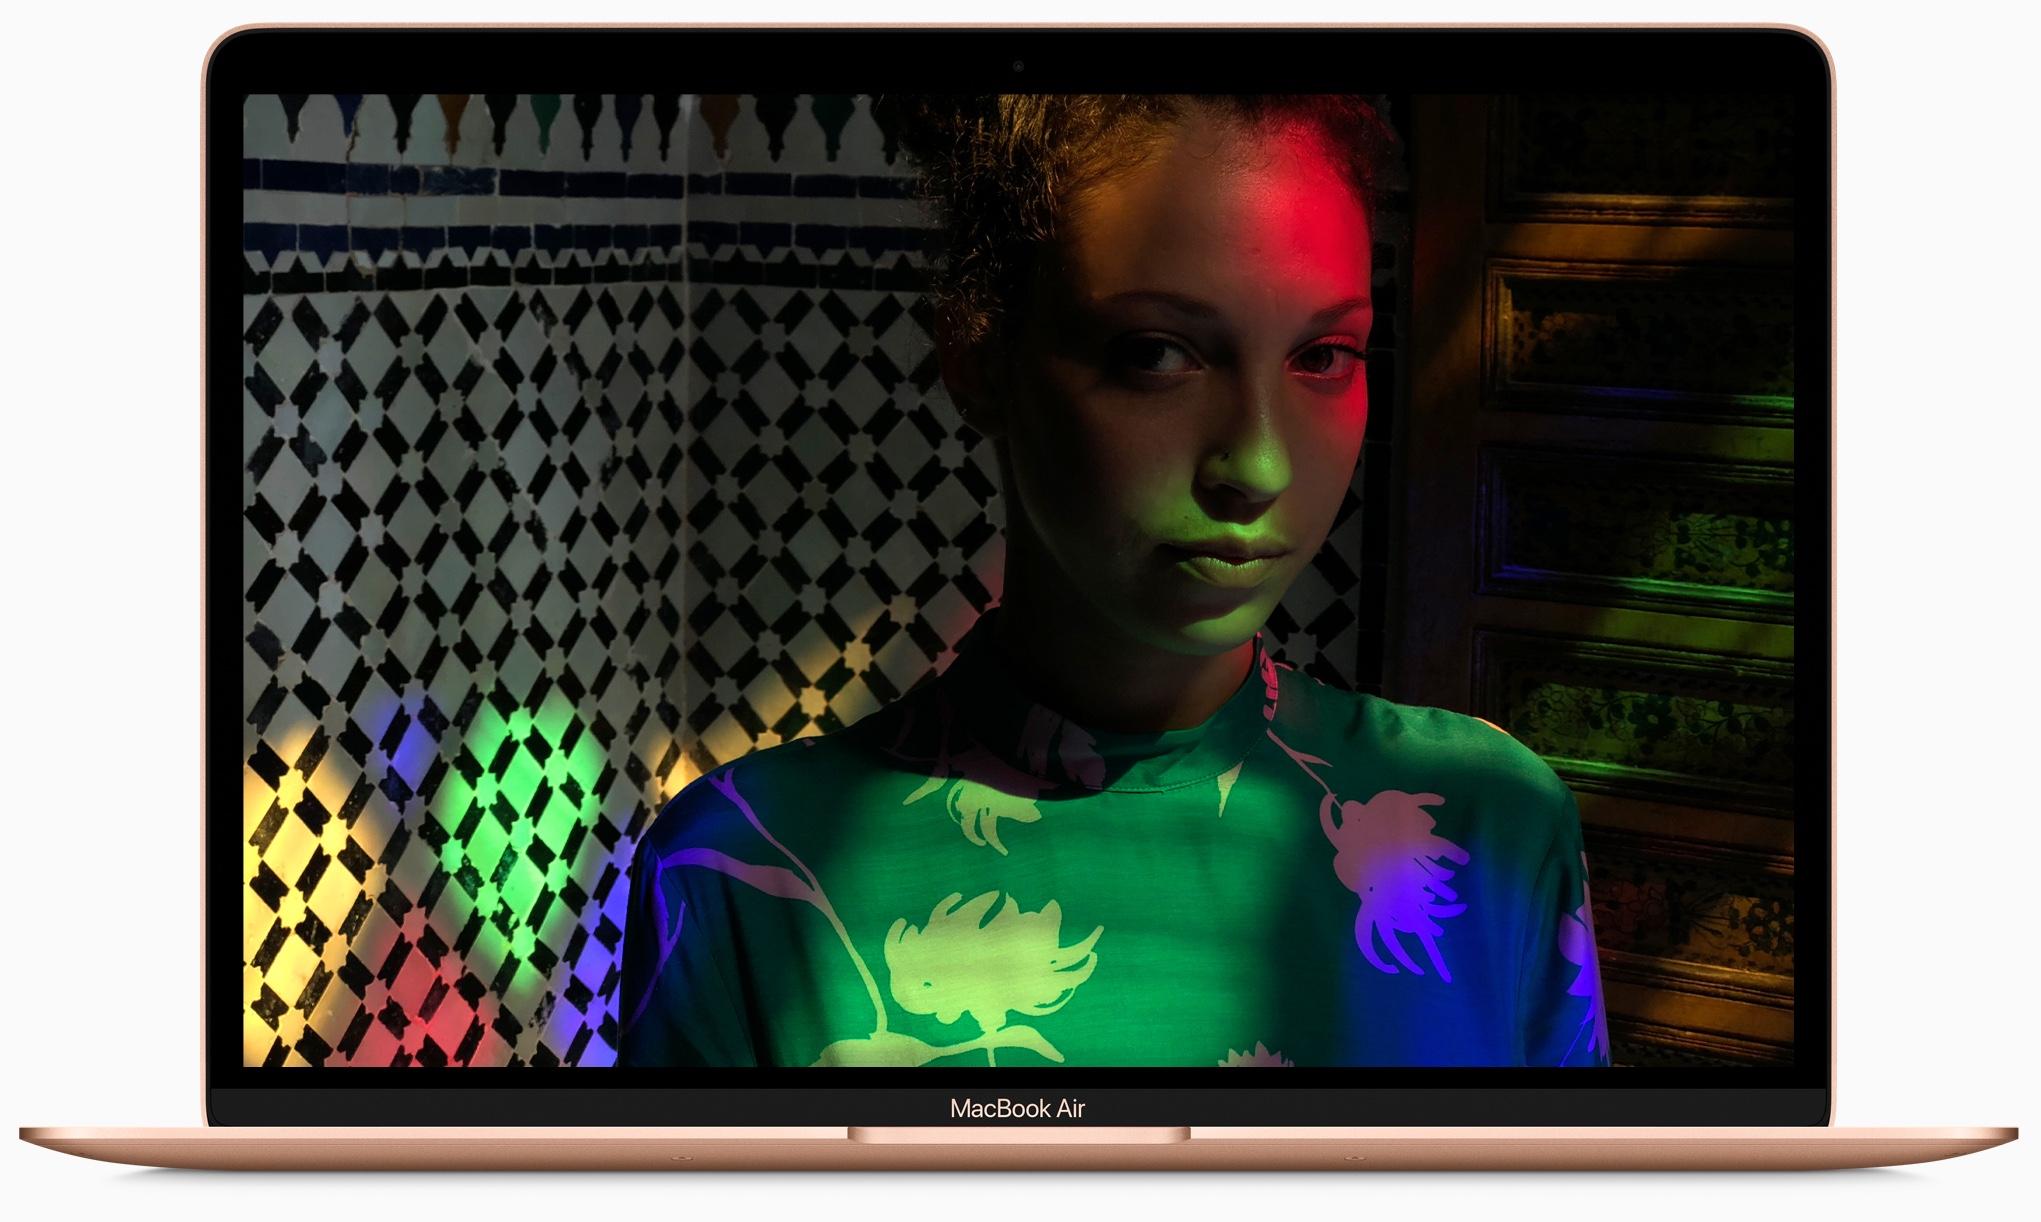 MacBook Air scherm 001